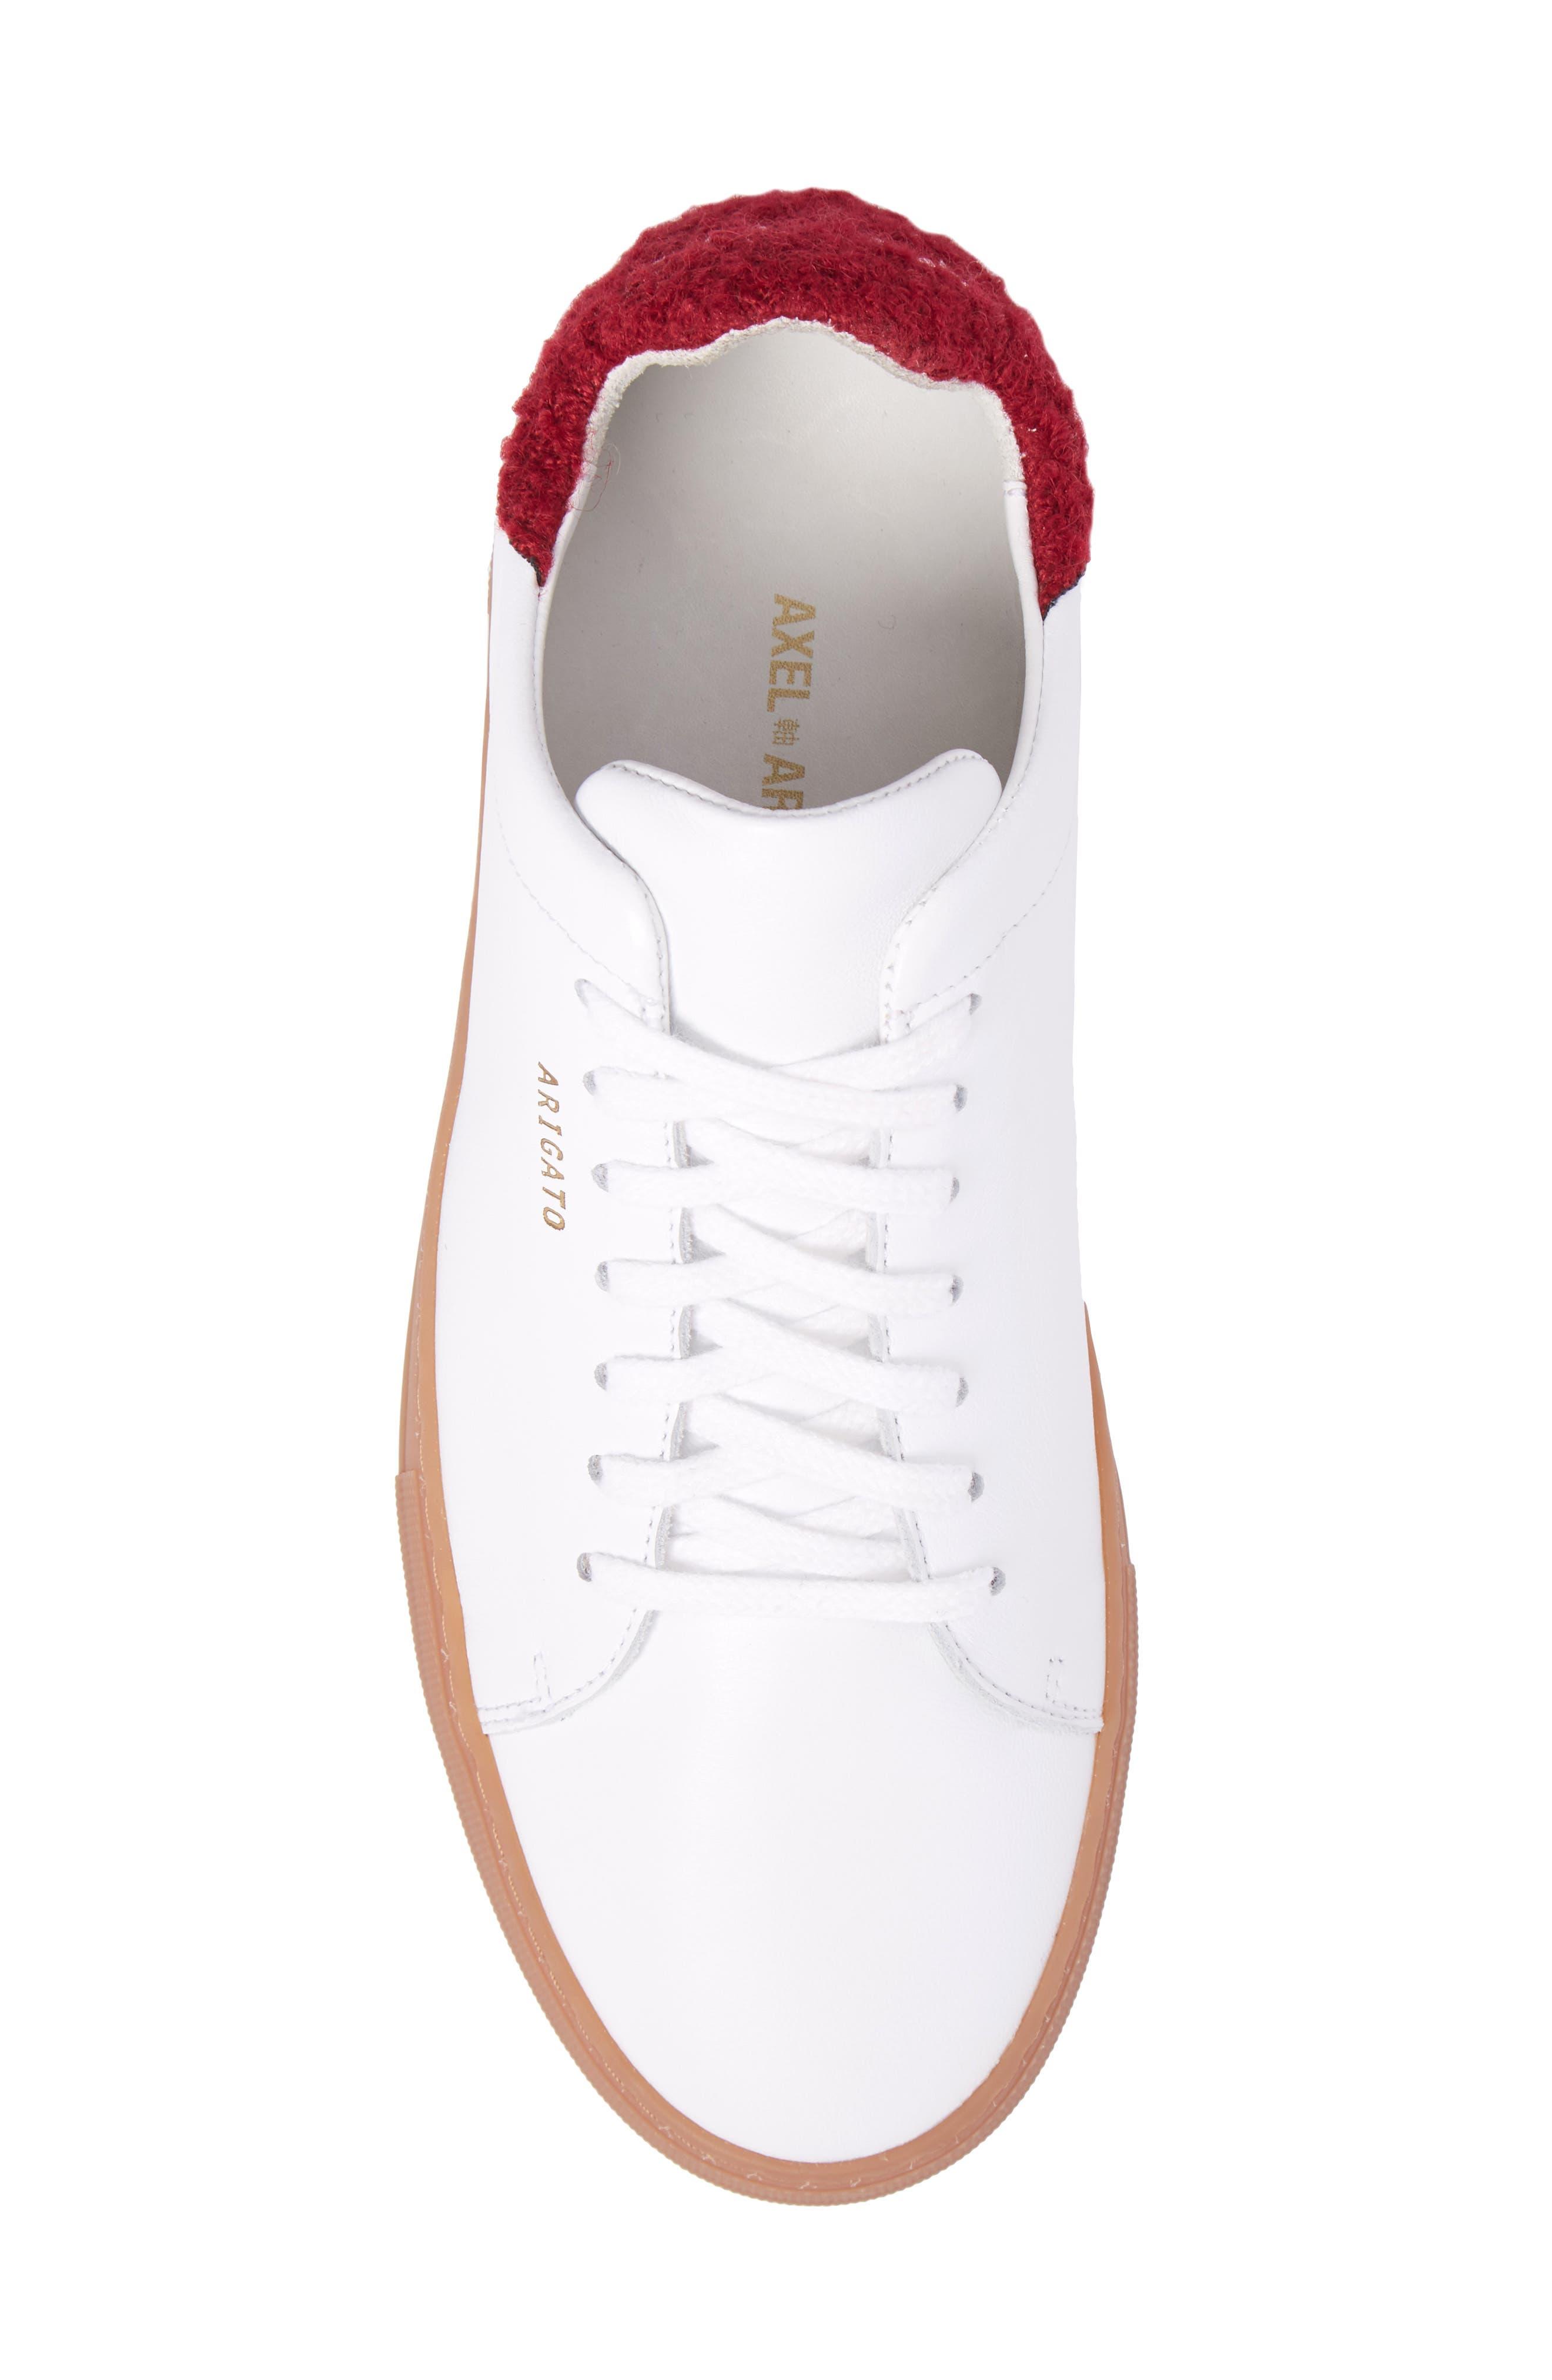 Clean 360 Fuzzy Heel Sneaker,                             Alternate thumbnail 5, color,                             White